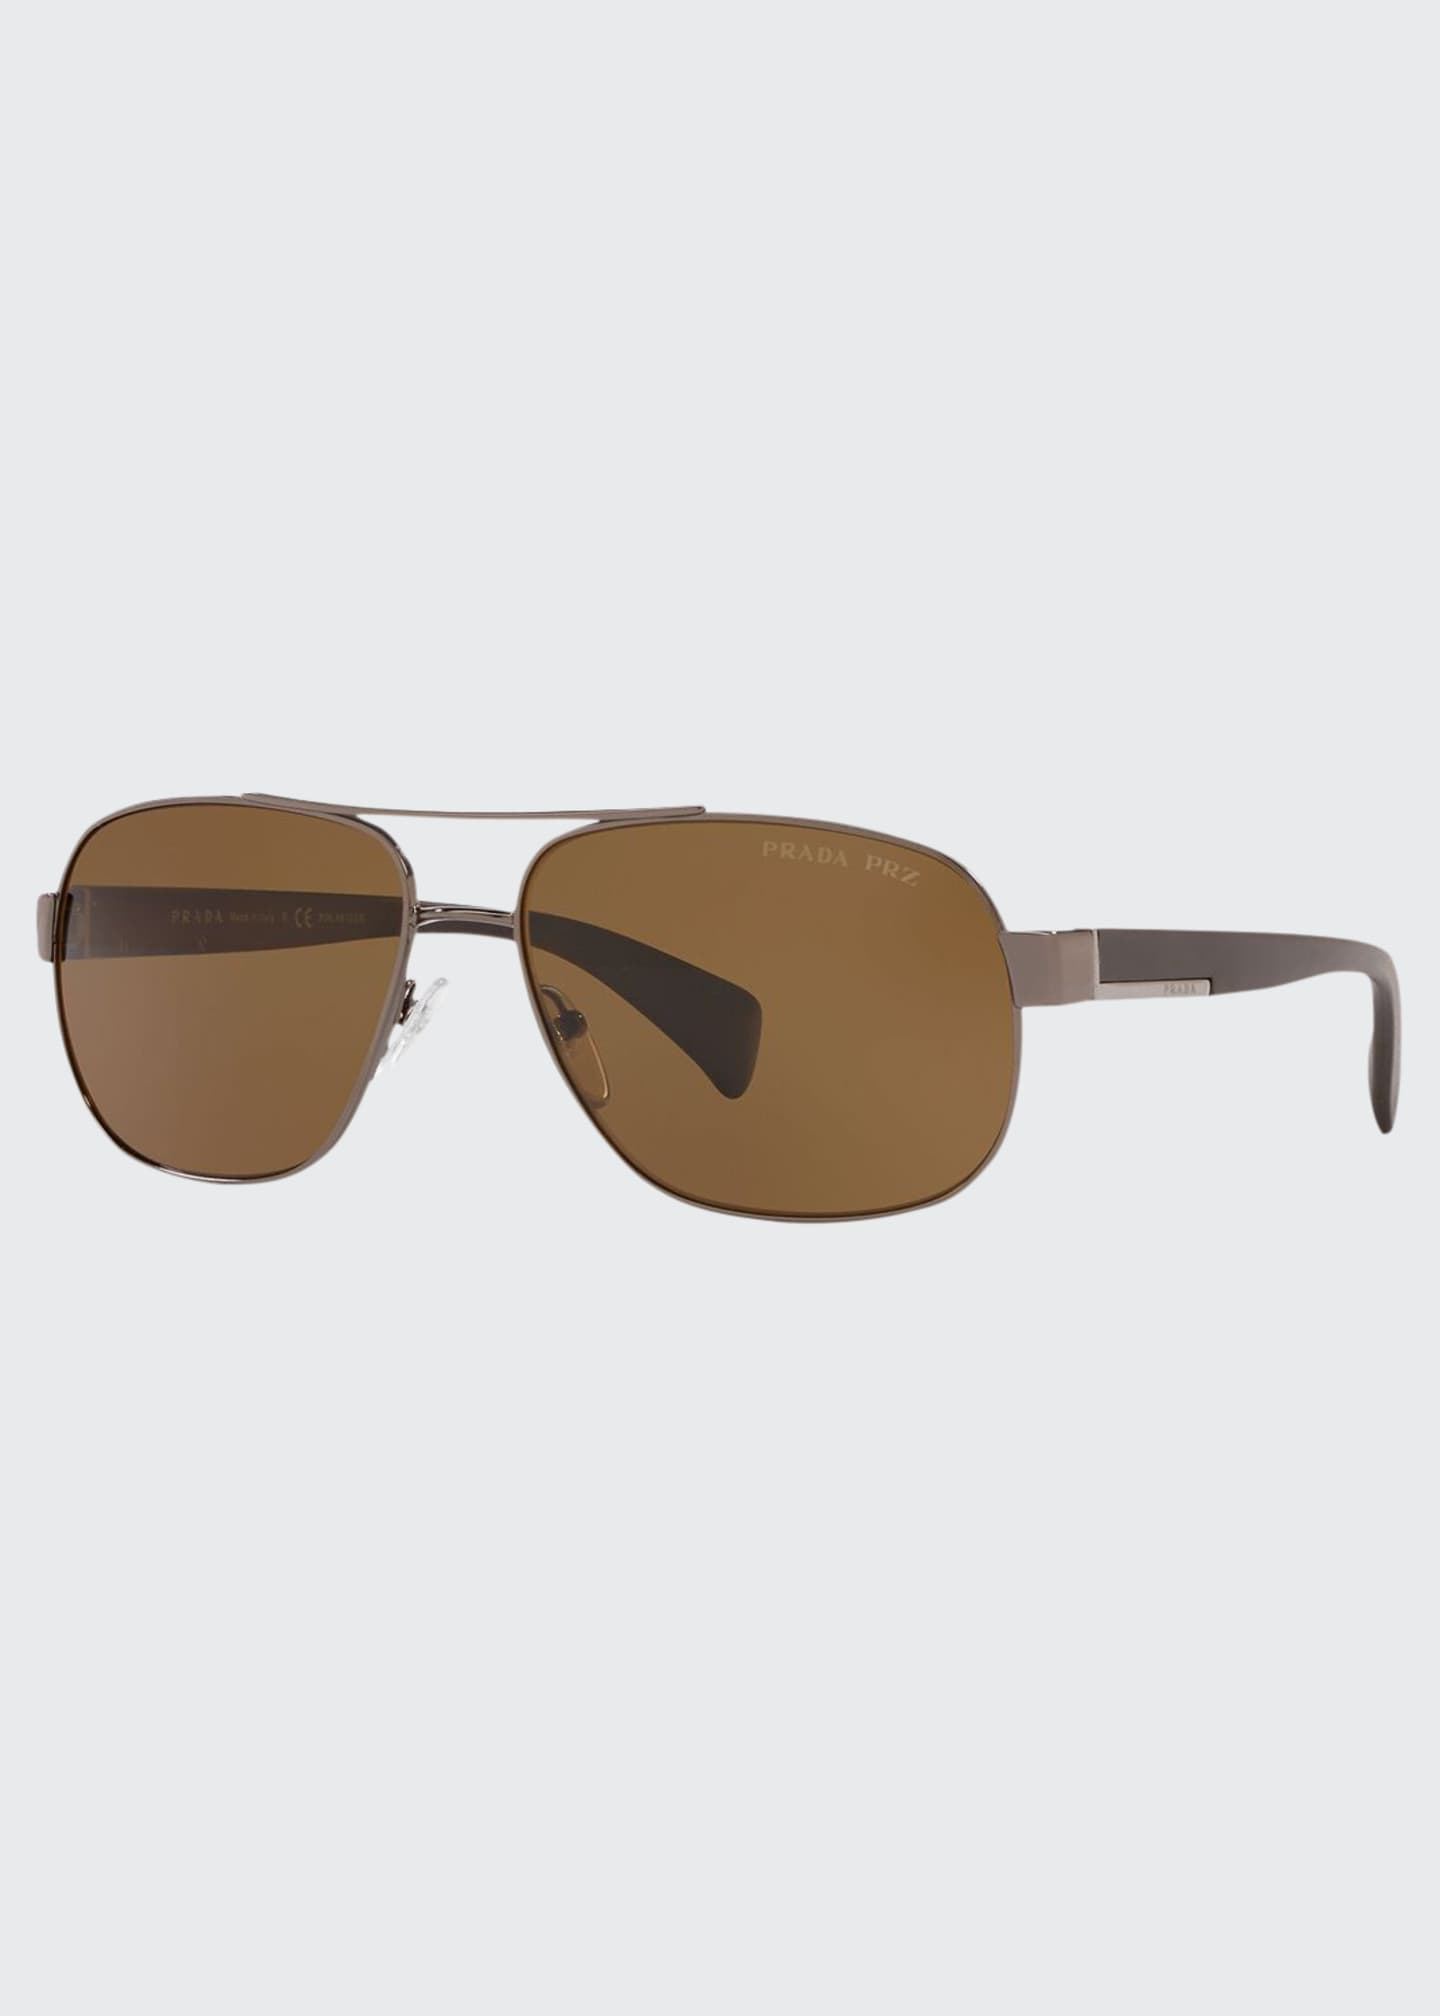 Prada Men's Polarized Metal Aviator Sunglasses